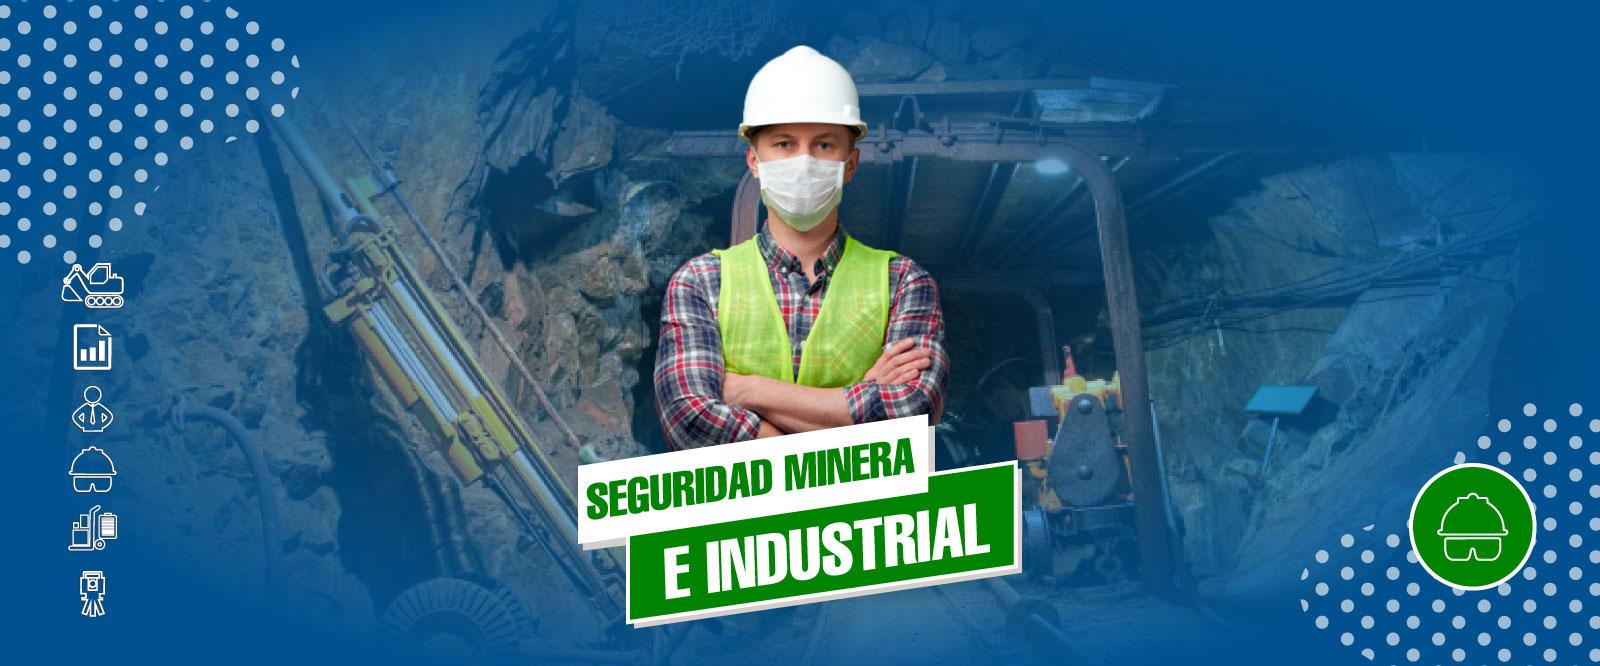 Seguridad Minera e Industrial